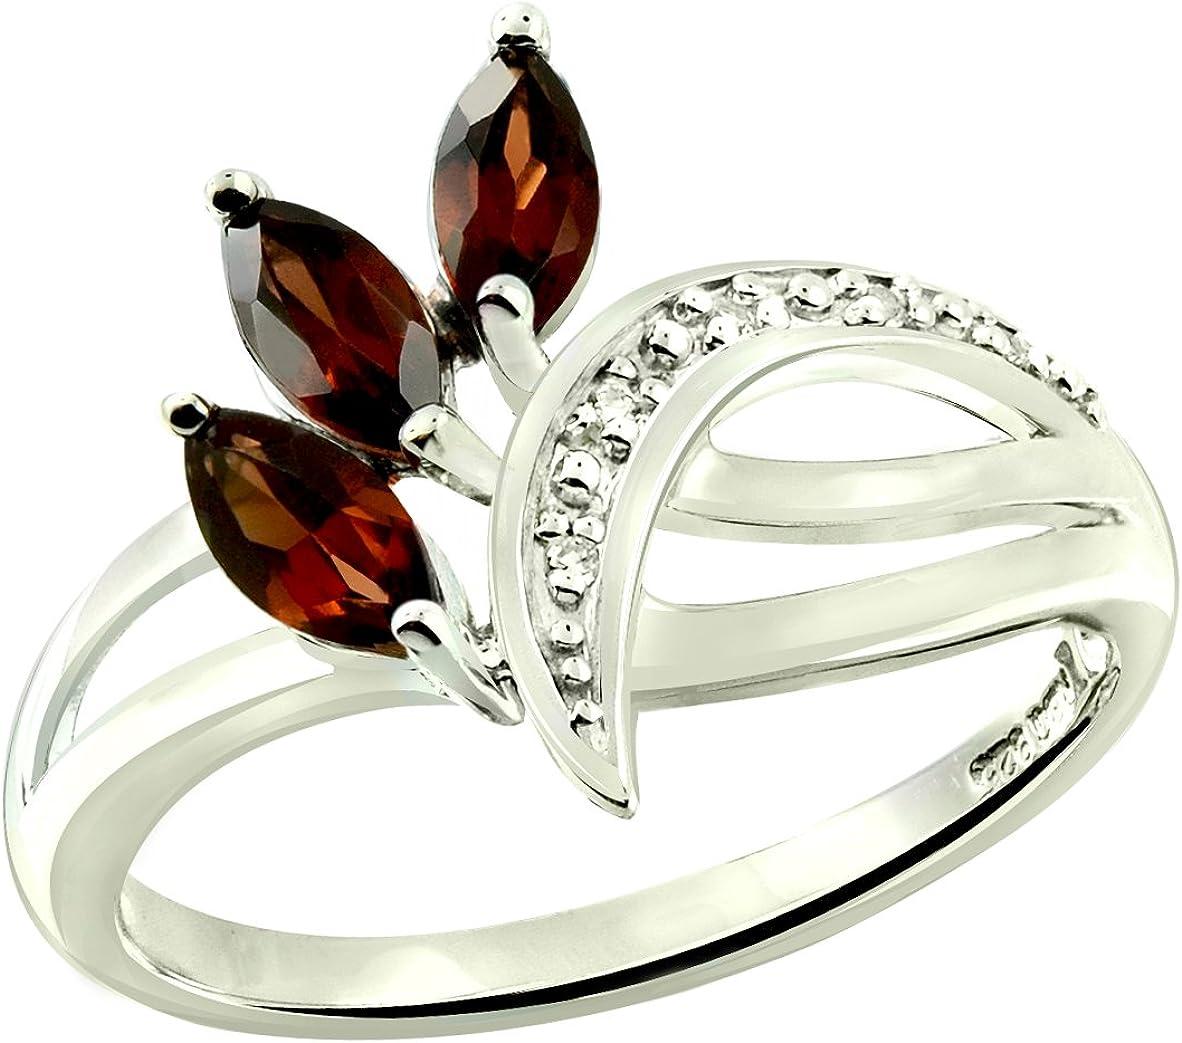 RB Gems Sterling Silver 925 Ring Genuine Gemstone 0.84 Sale price wit Carat Regular discount